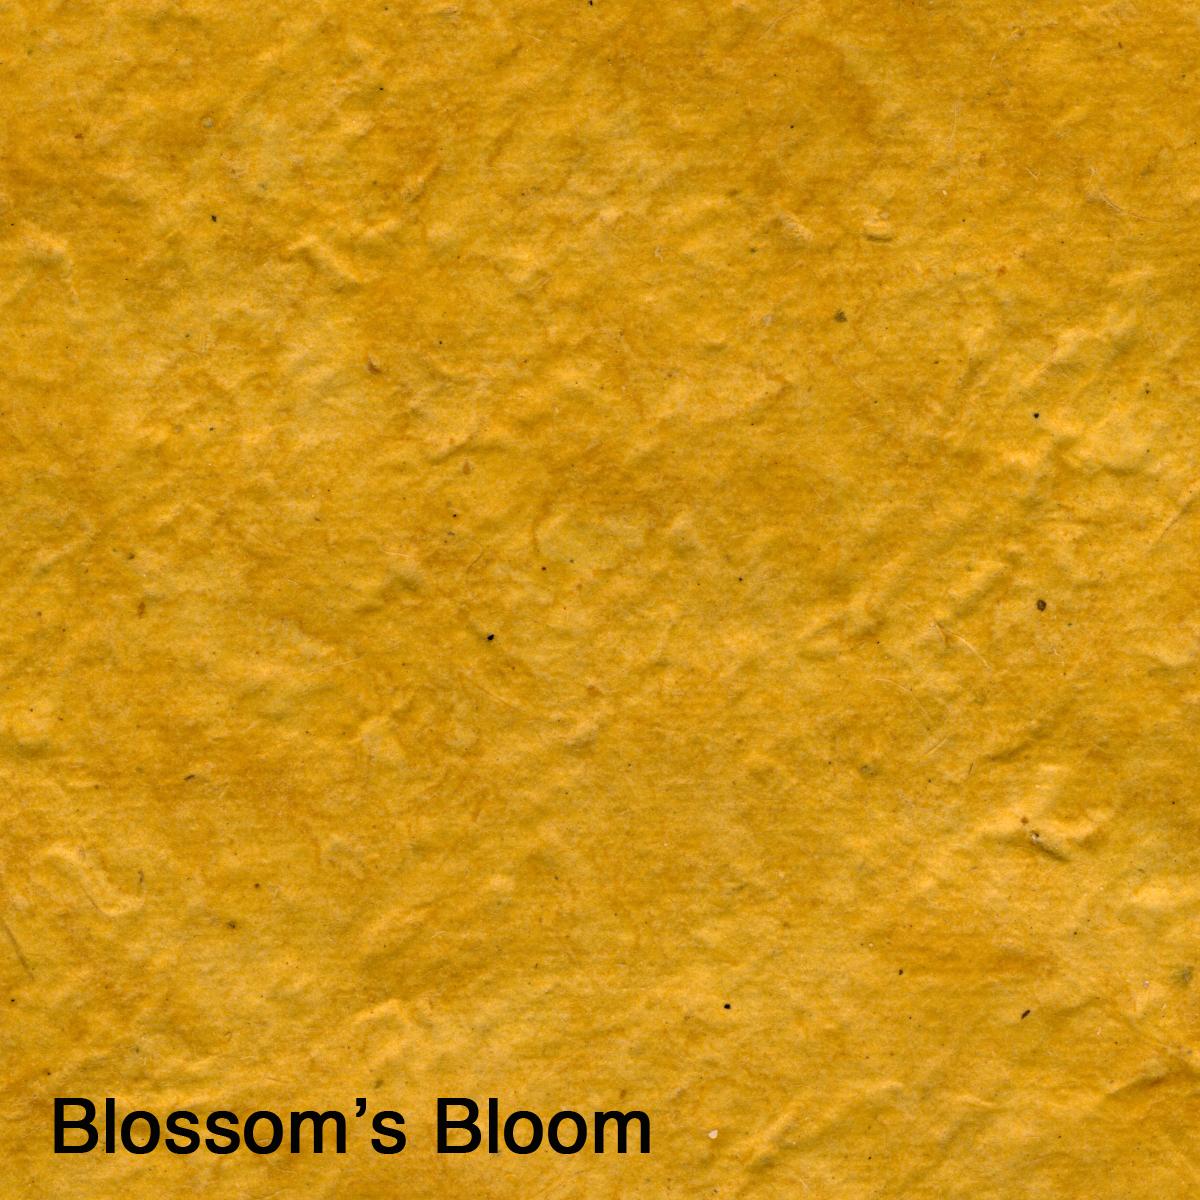 Blossom's Bloom.jpg